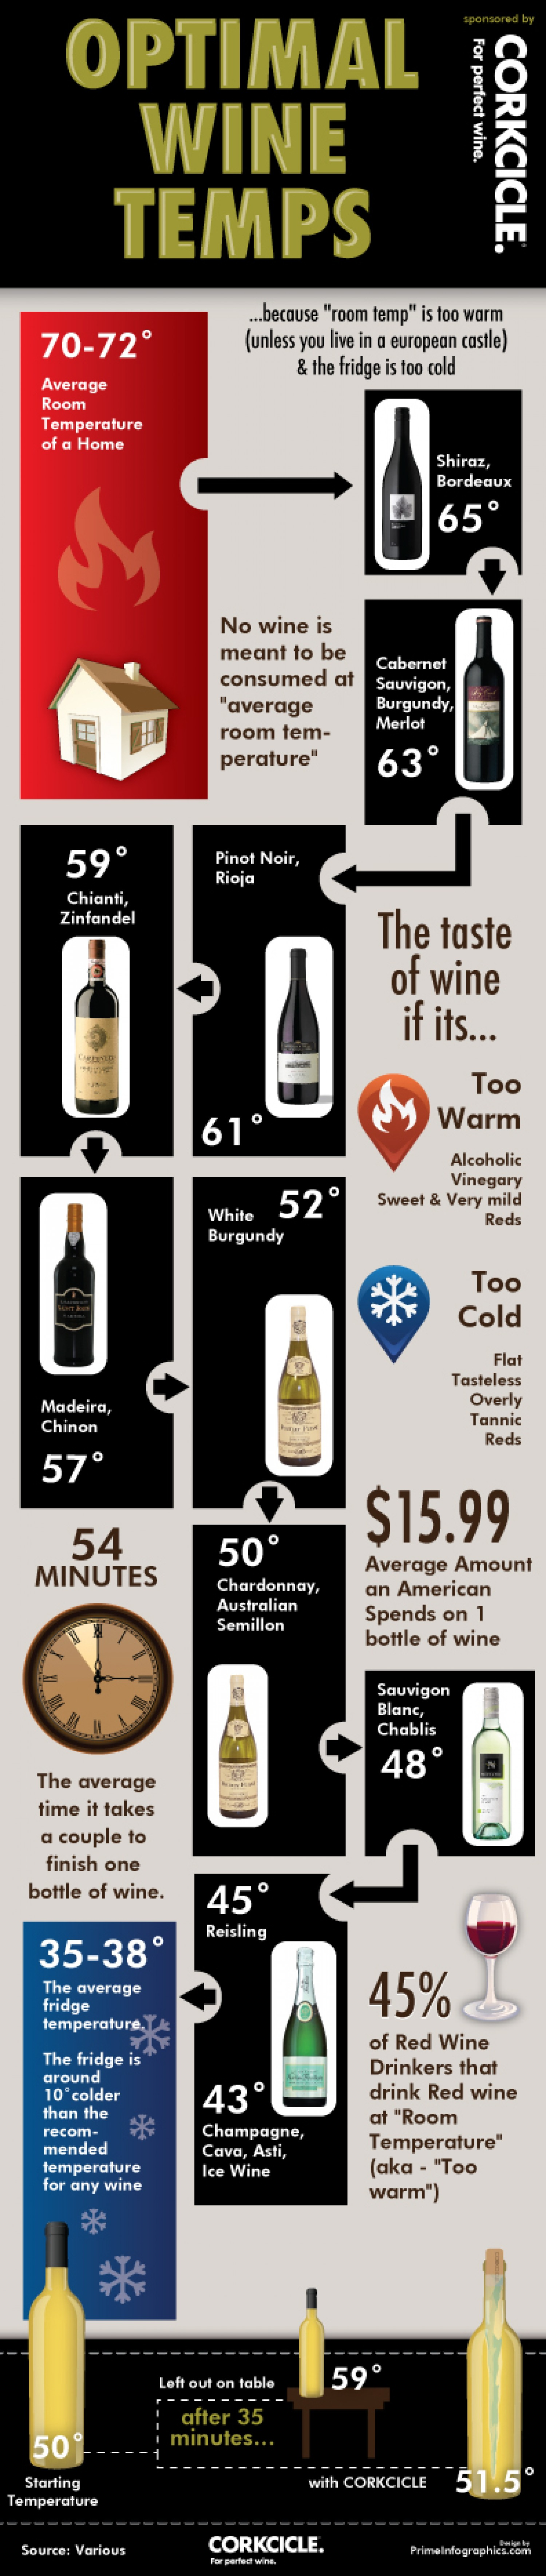 11. Wine in the Fridge